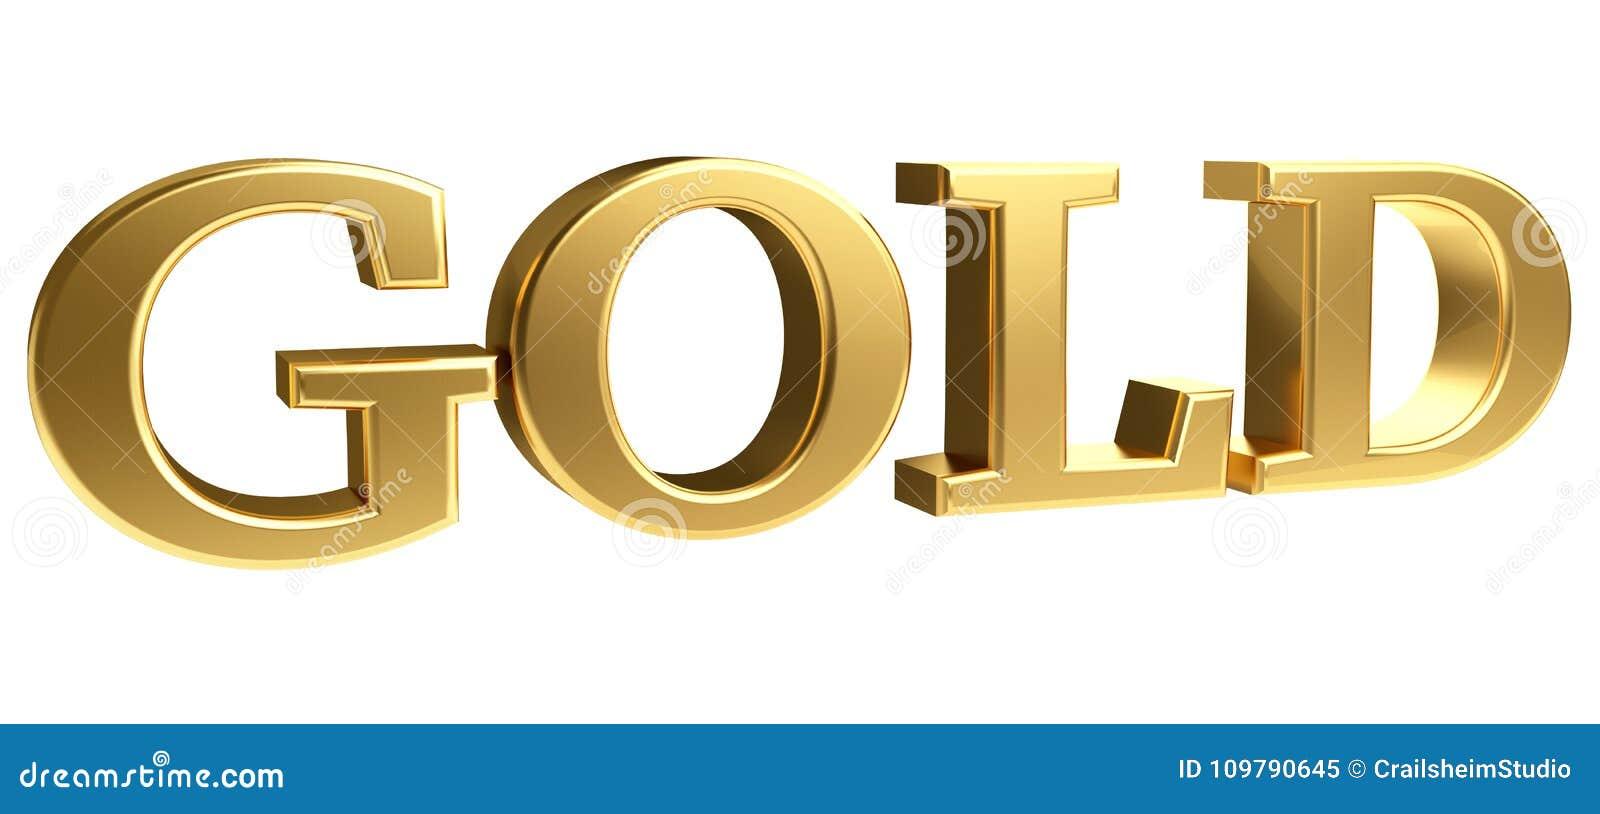 gold bold letters 3d rendering stock illustration illustration of